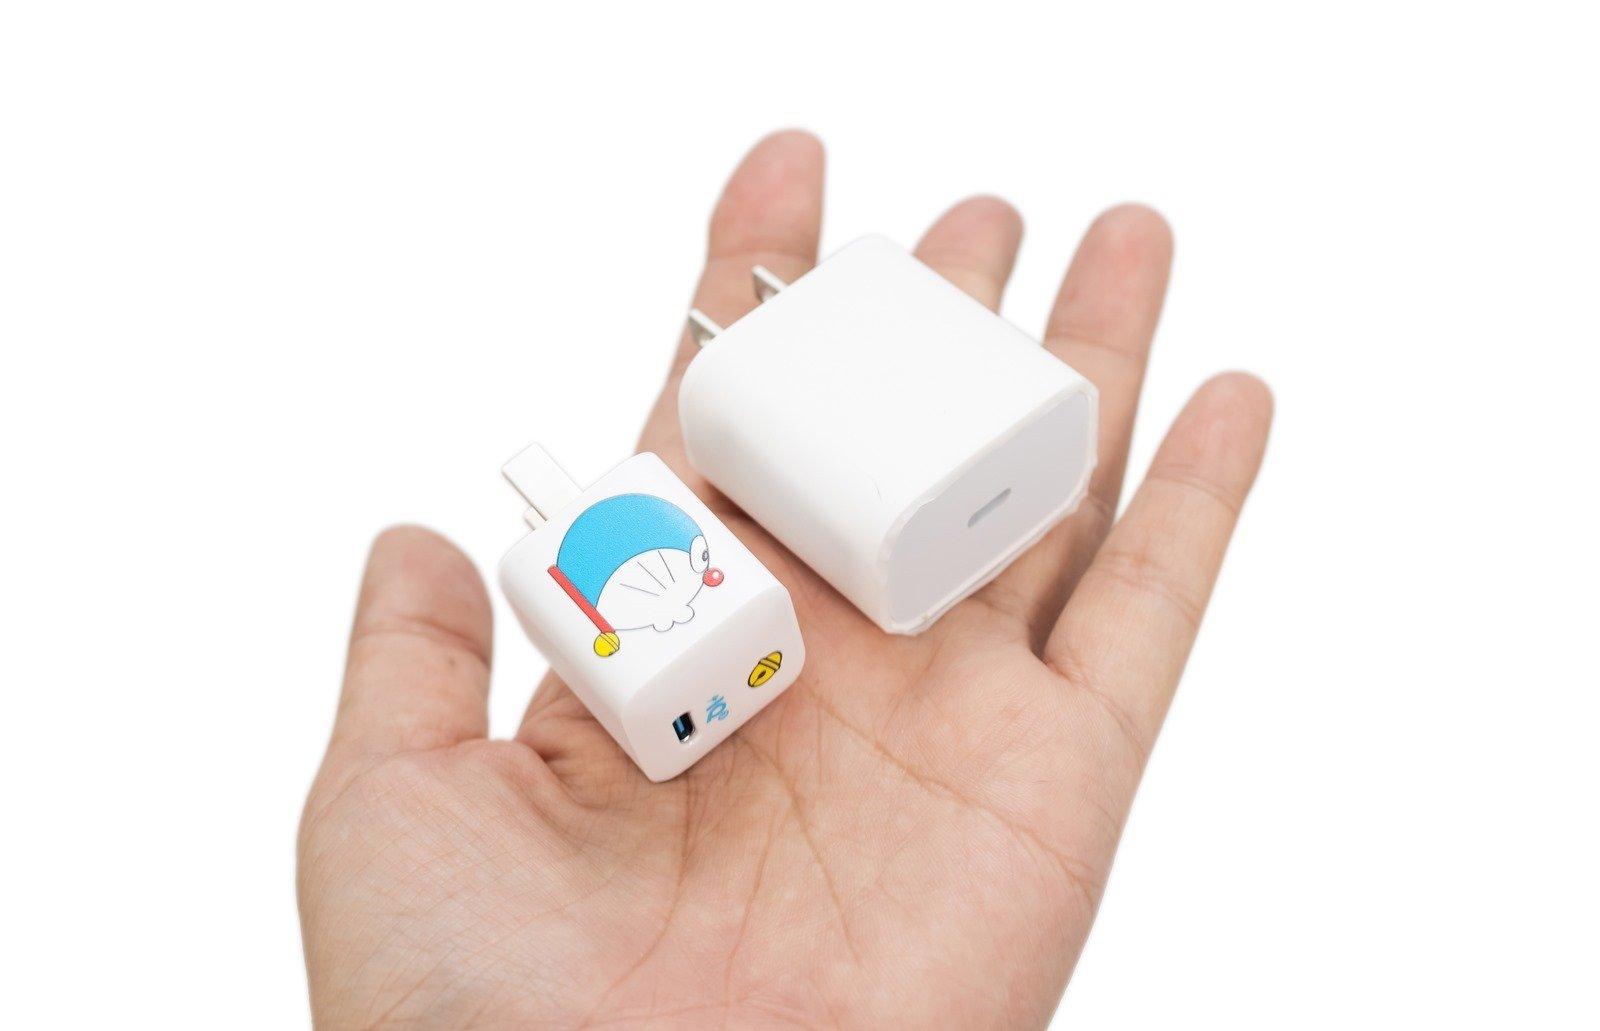 Anker 哆啦 A 夢(小叮噹)聯名款 Nano 20W 充電器 / 65W 充電器 / 線材 / 無線充電板開箱 @3C 達人廖阿輝